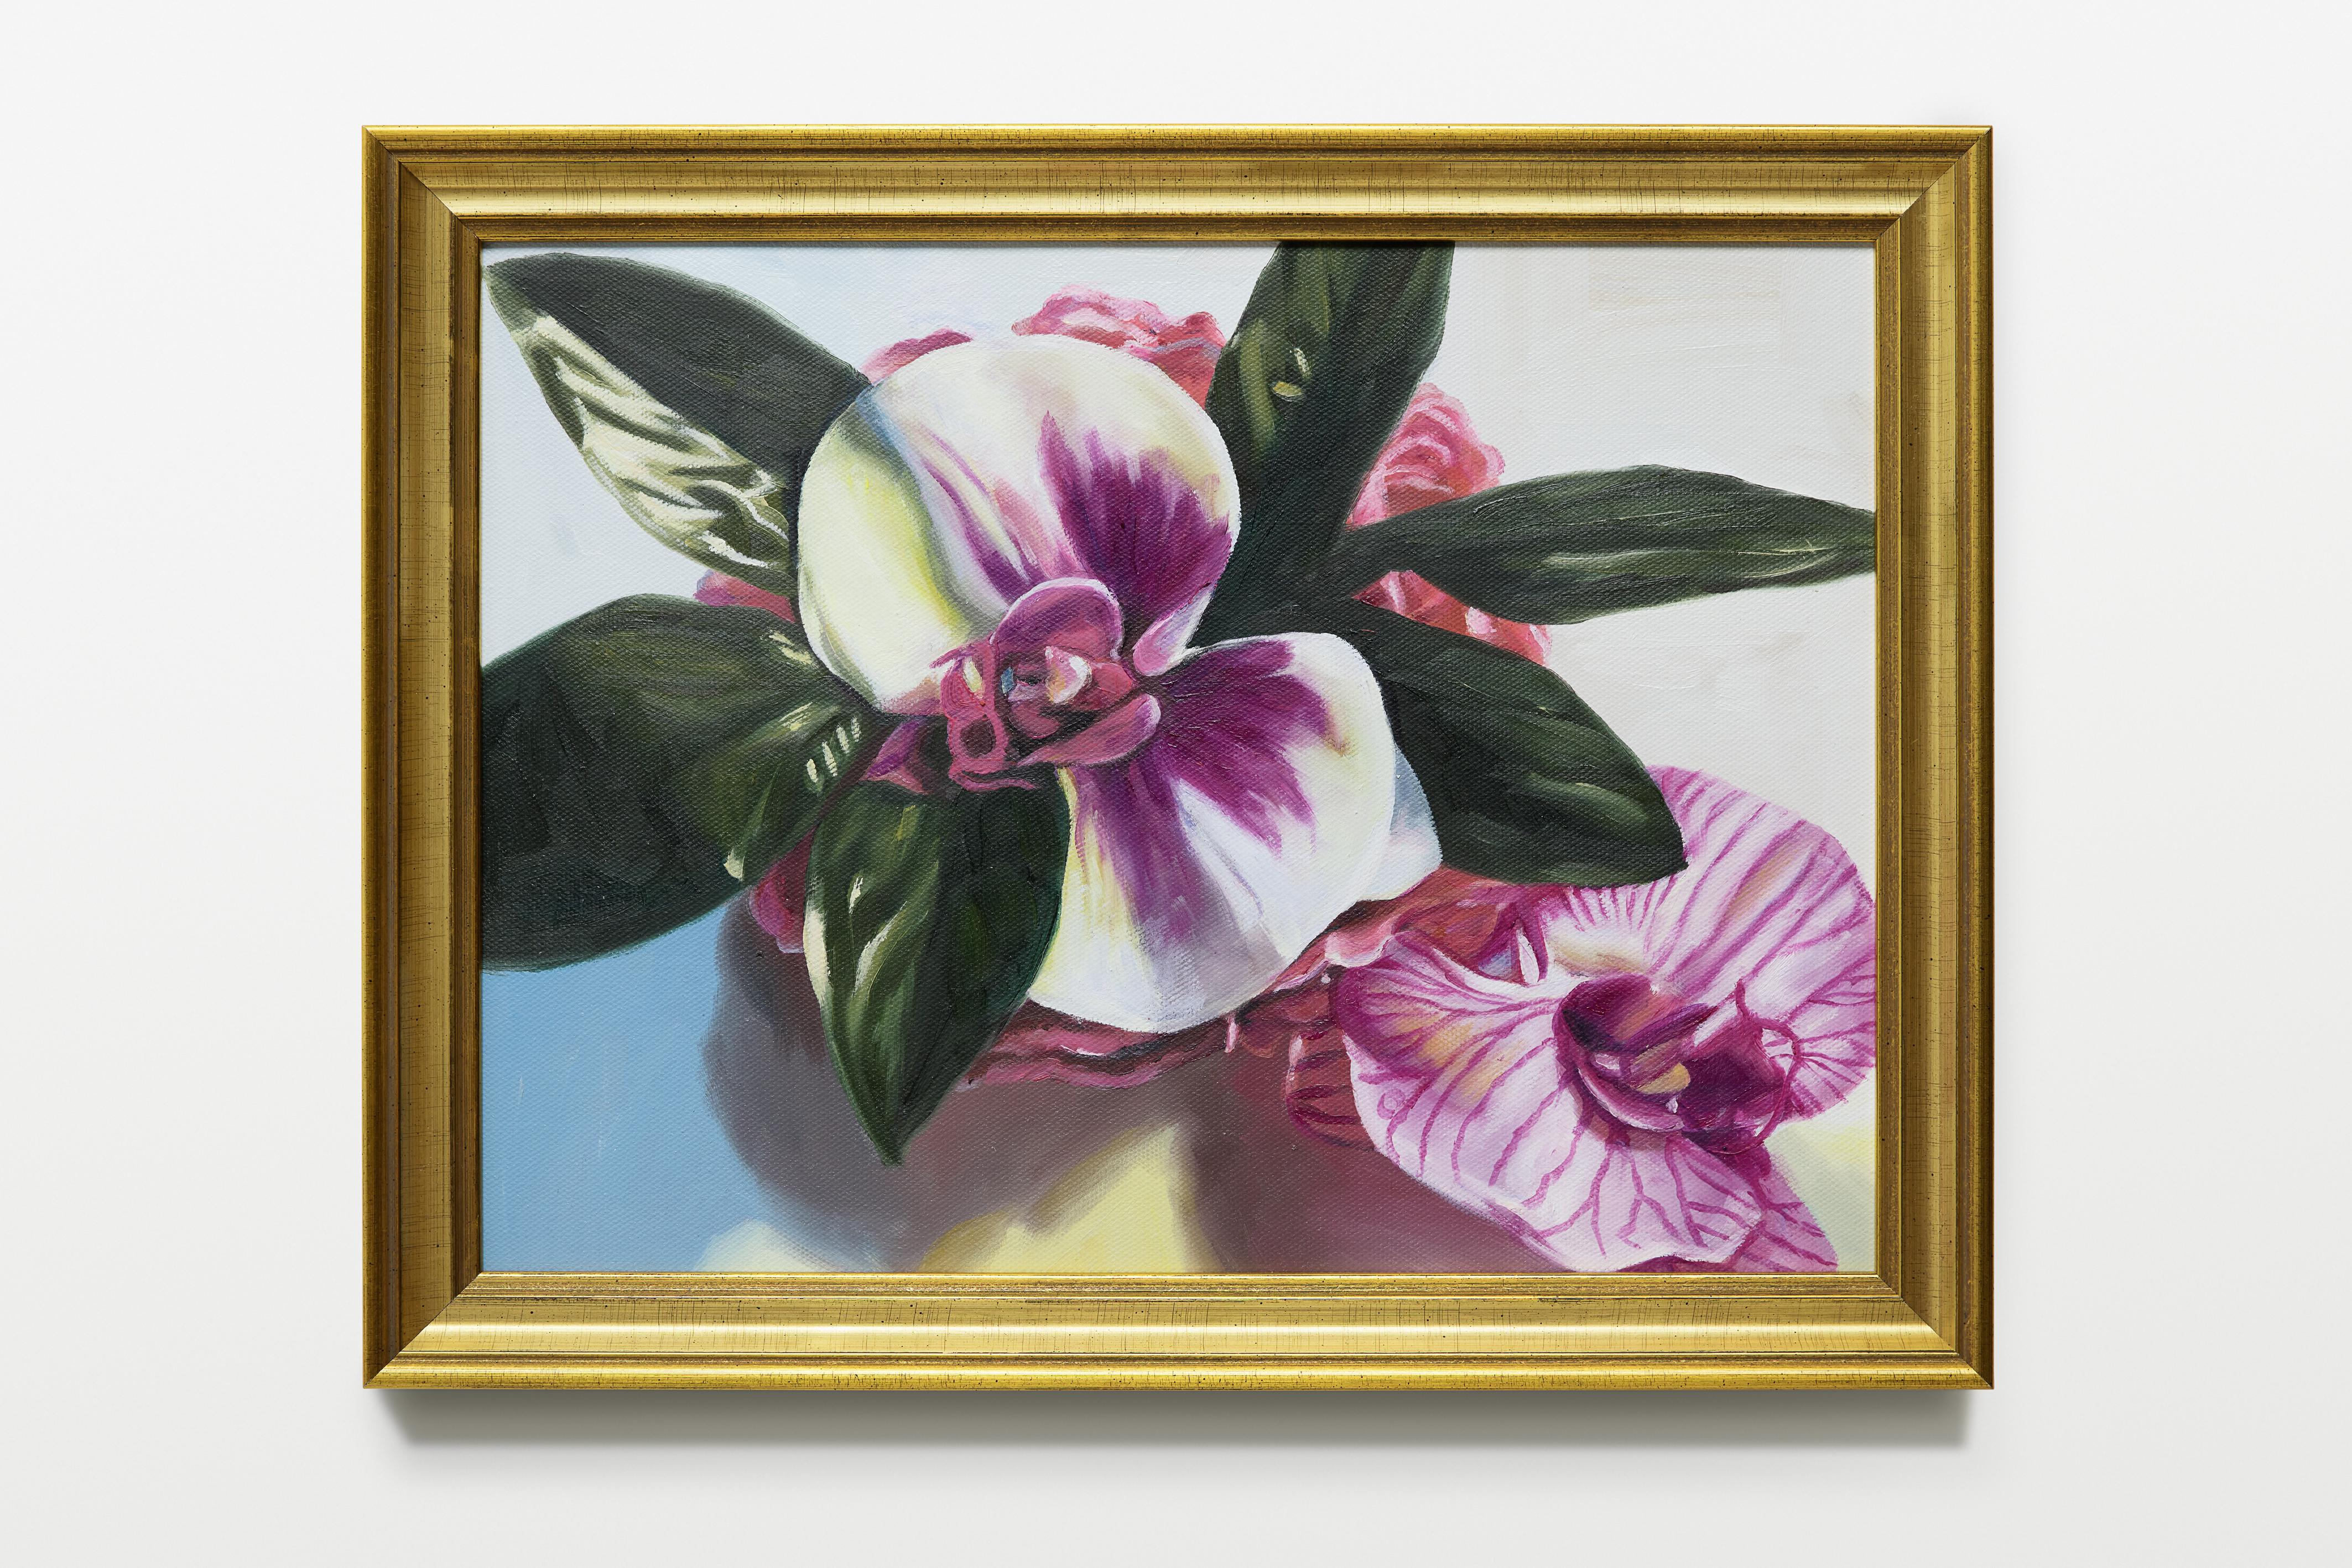 Swantje Güntzel, Plastic Flowers, Öl auf Leinwand